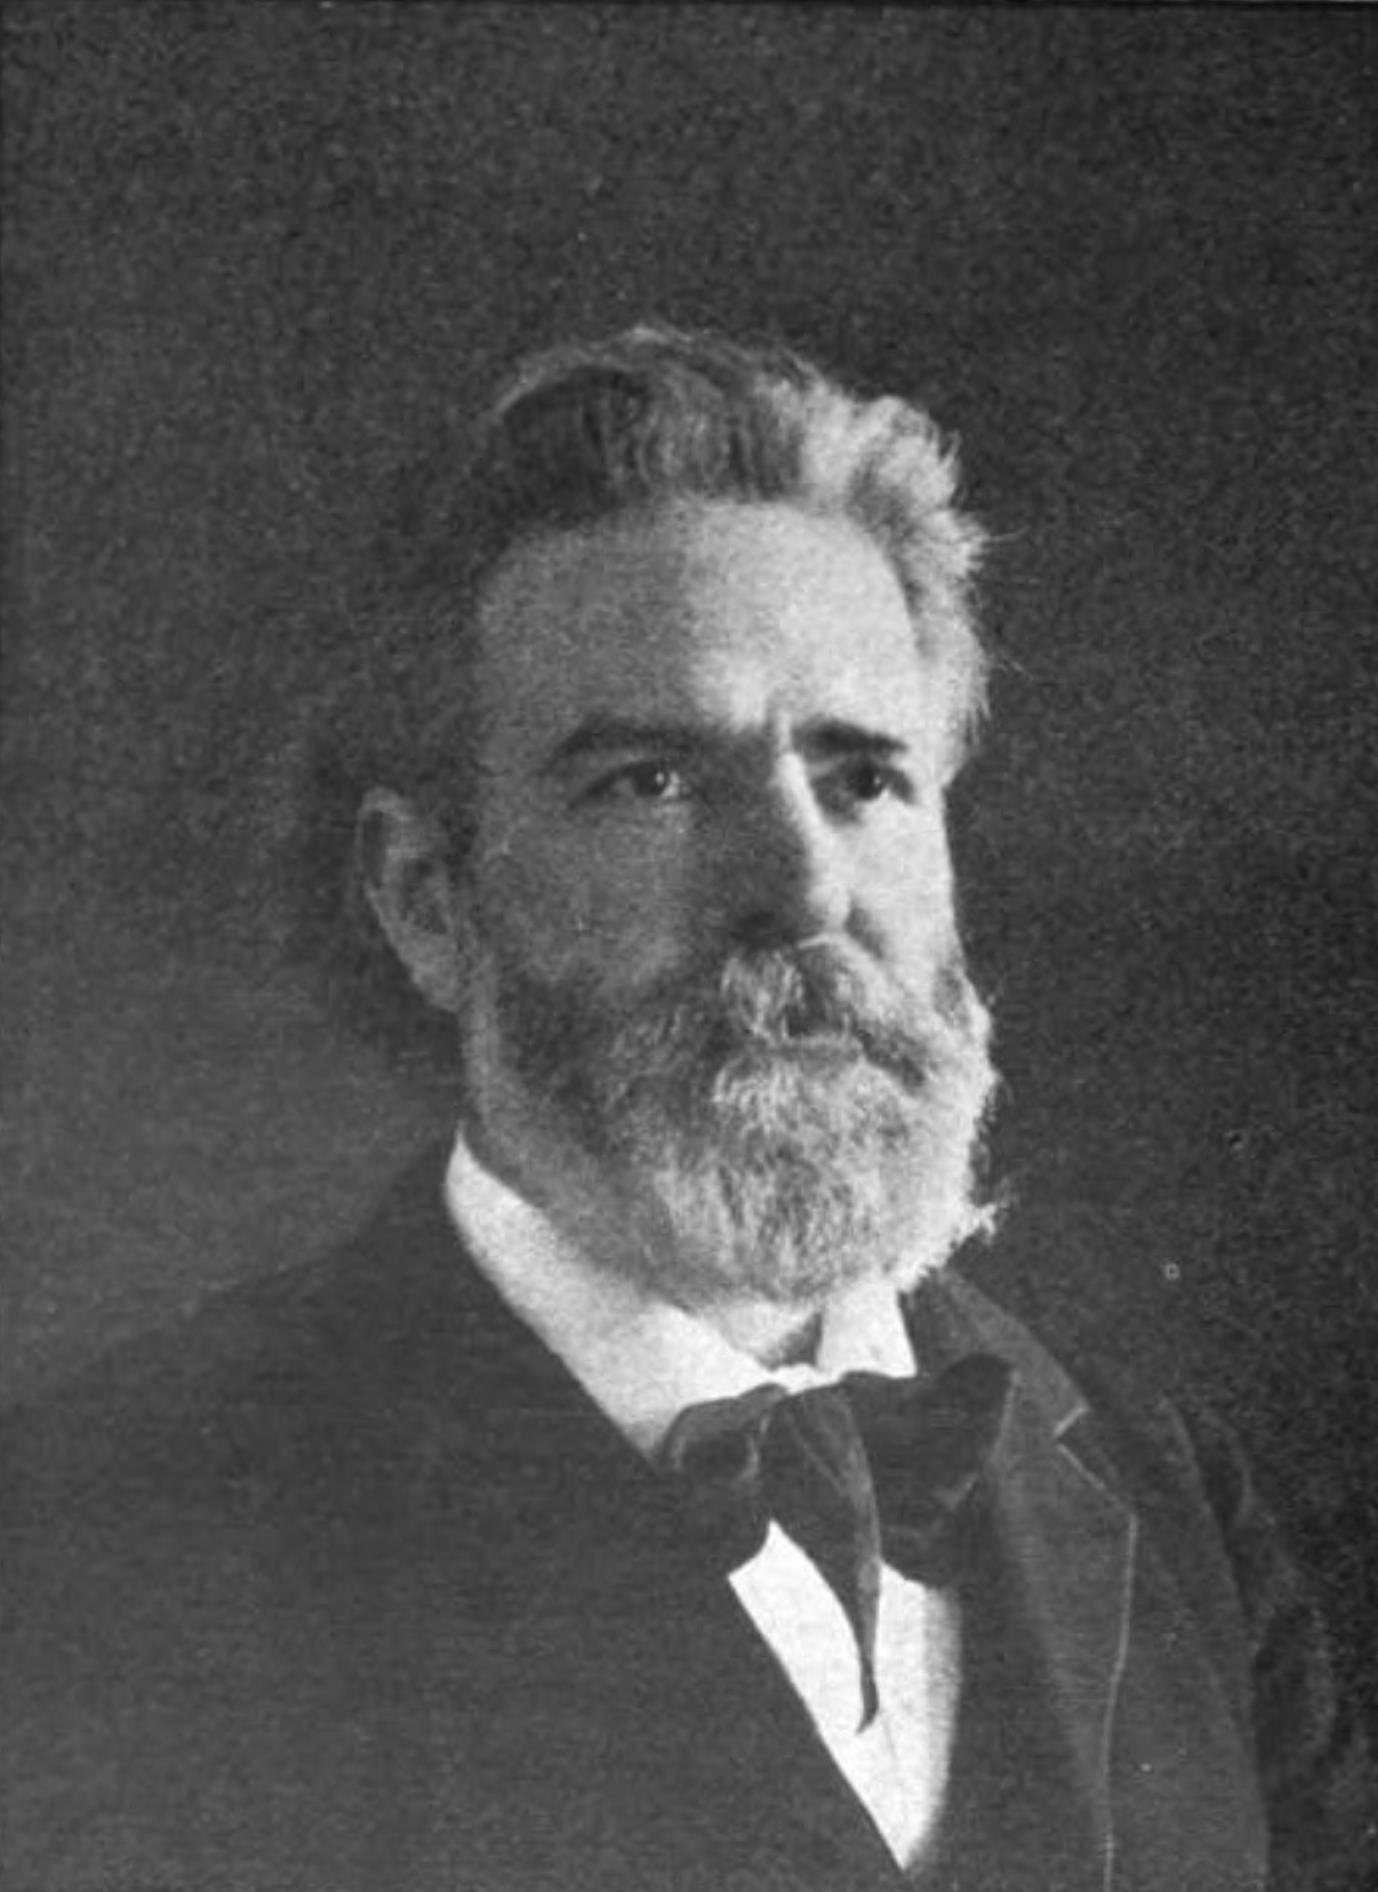 Edwin Markham markham 1852